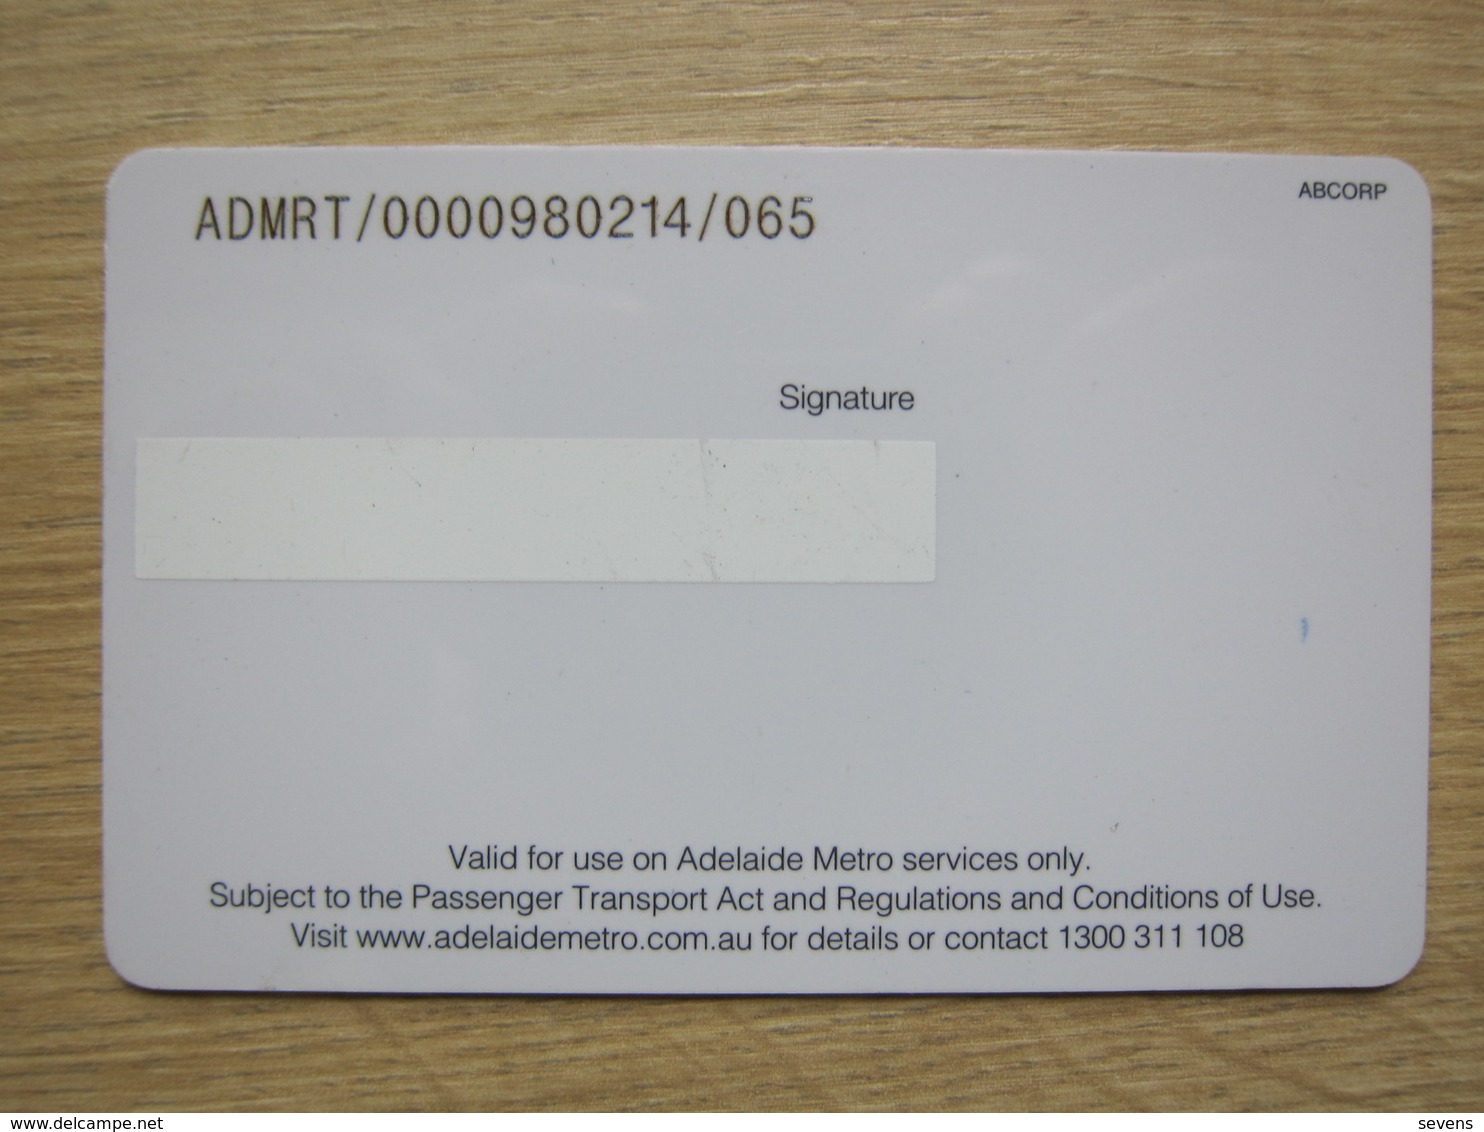 Adelaide Metro Regular Card,Rundle Mall Pigs - Phonecards